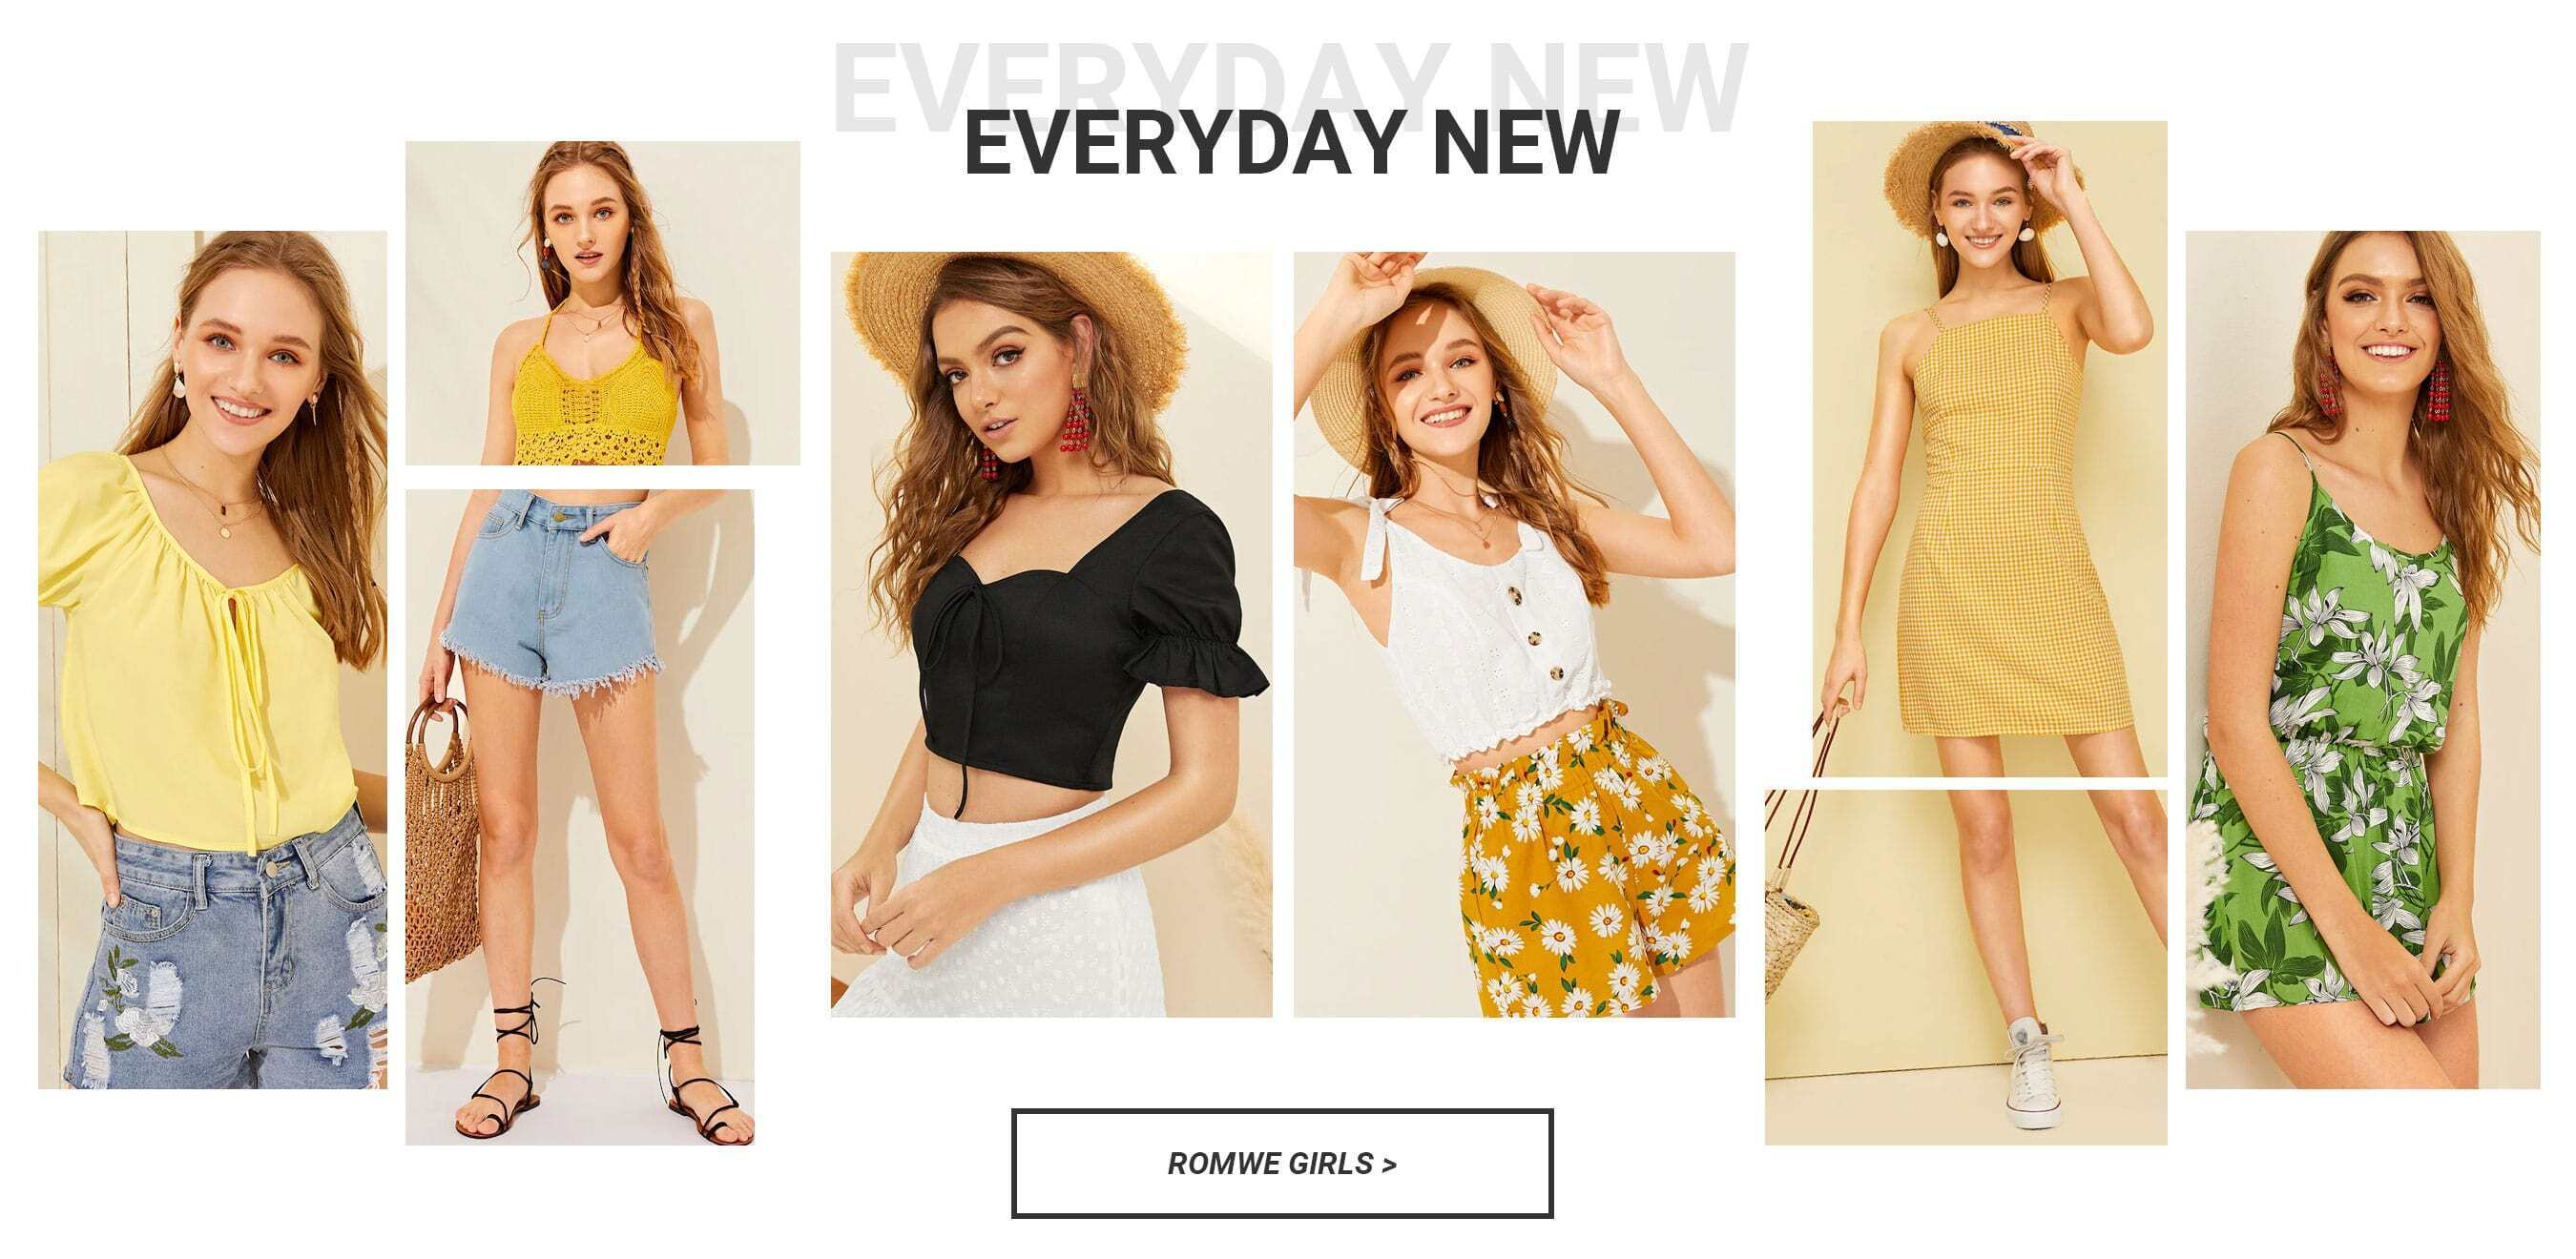 e0b887e0d5f Shop The Latest Girls   Guys Fashion Trends at ROMWE